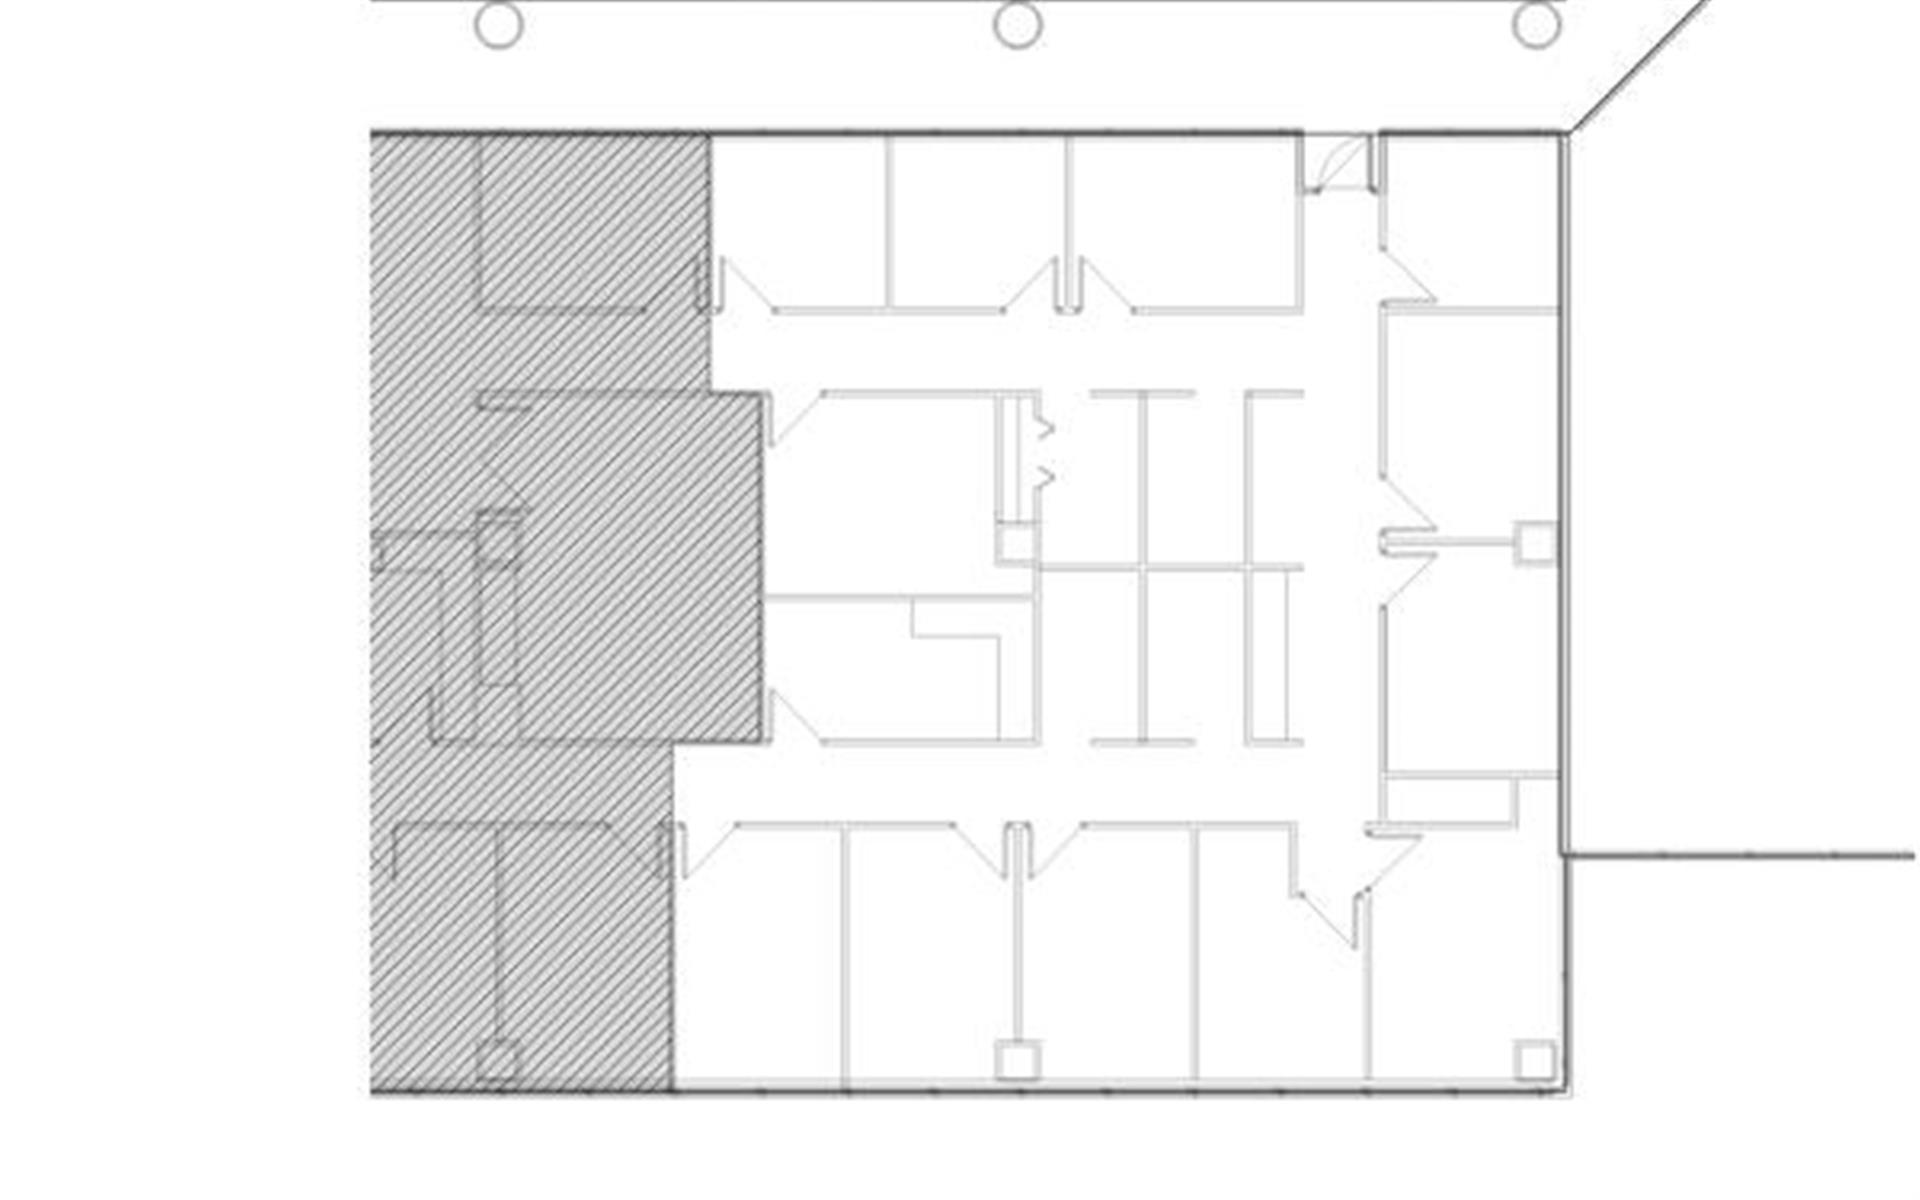 WashingtonREIT | Silverline Center - Team Office | Suite A340